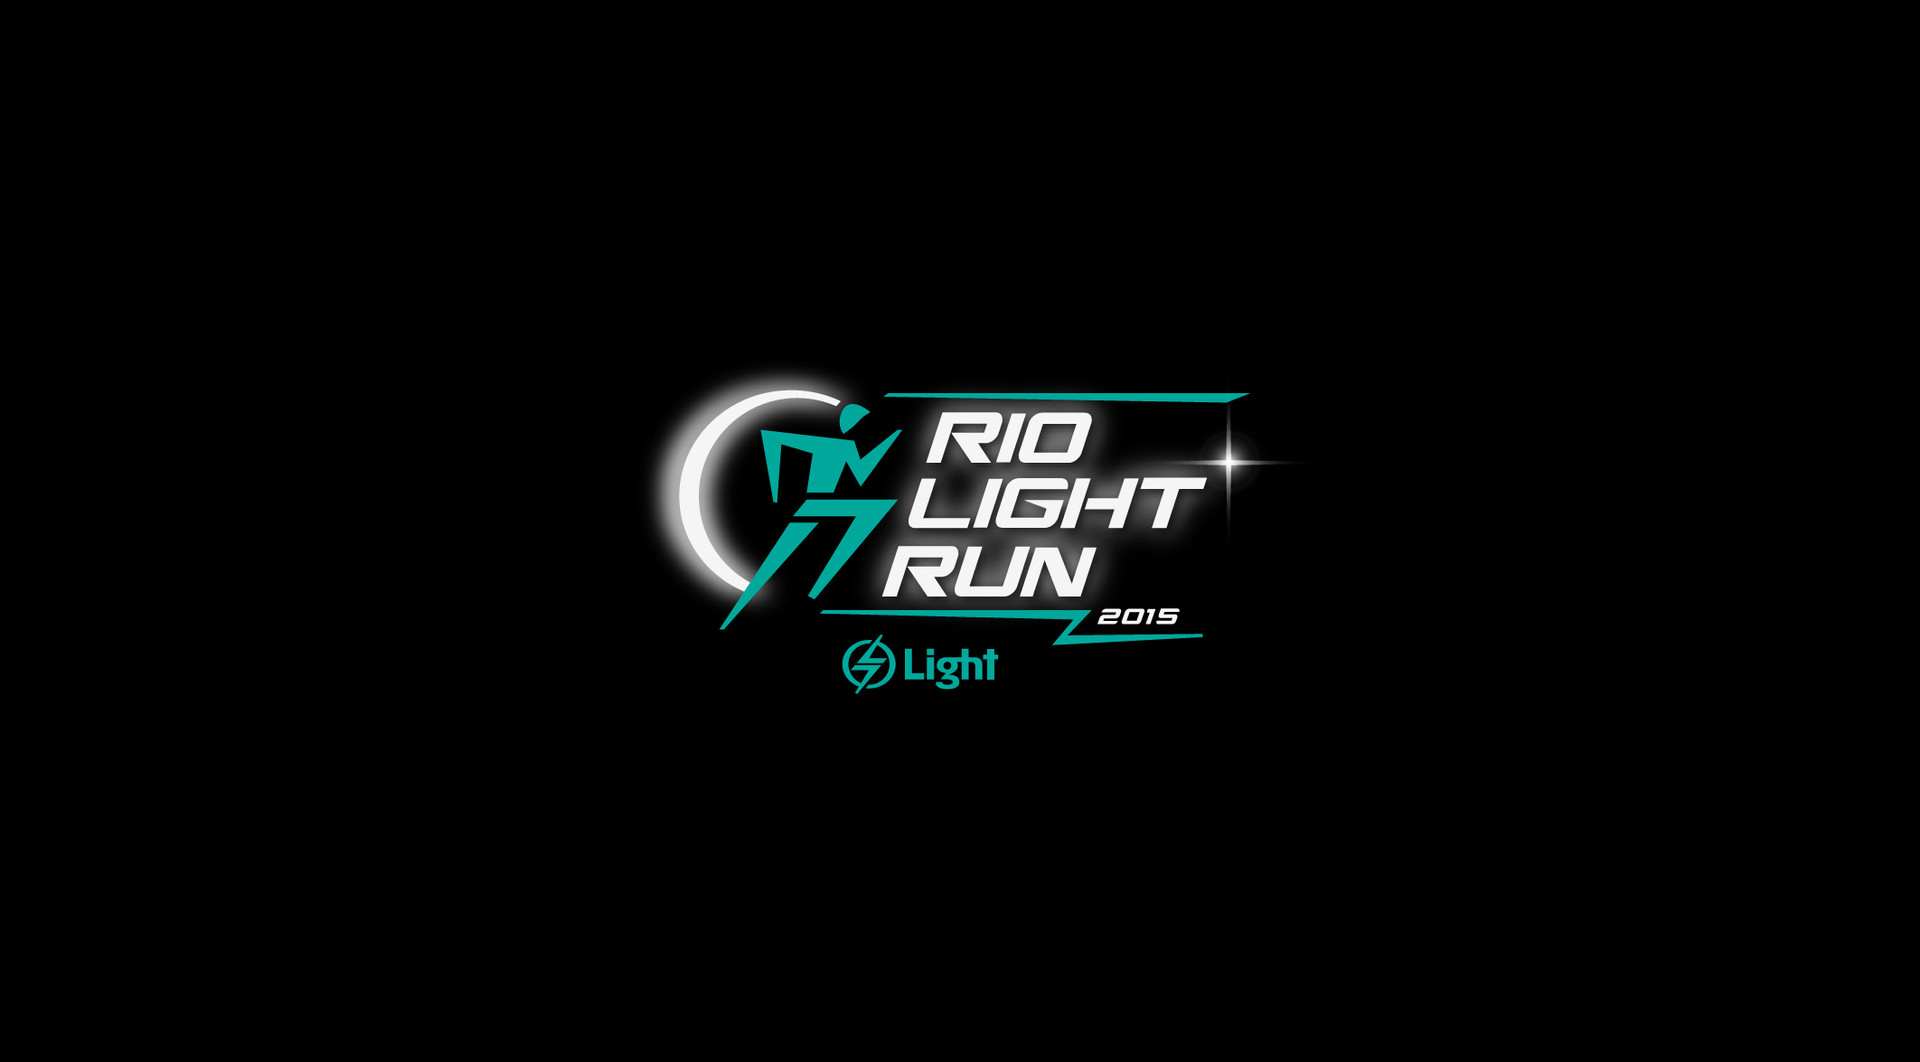 RIO_LIGHT_RUN_2017-6.jpg